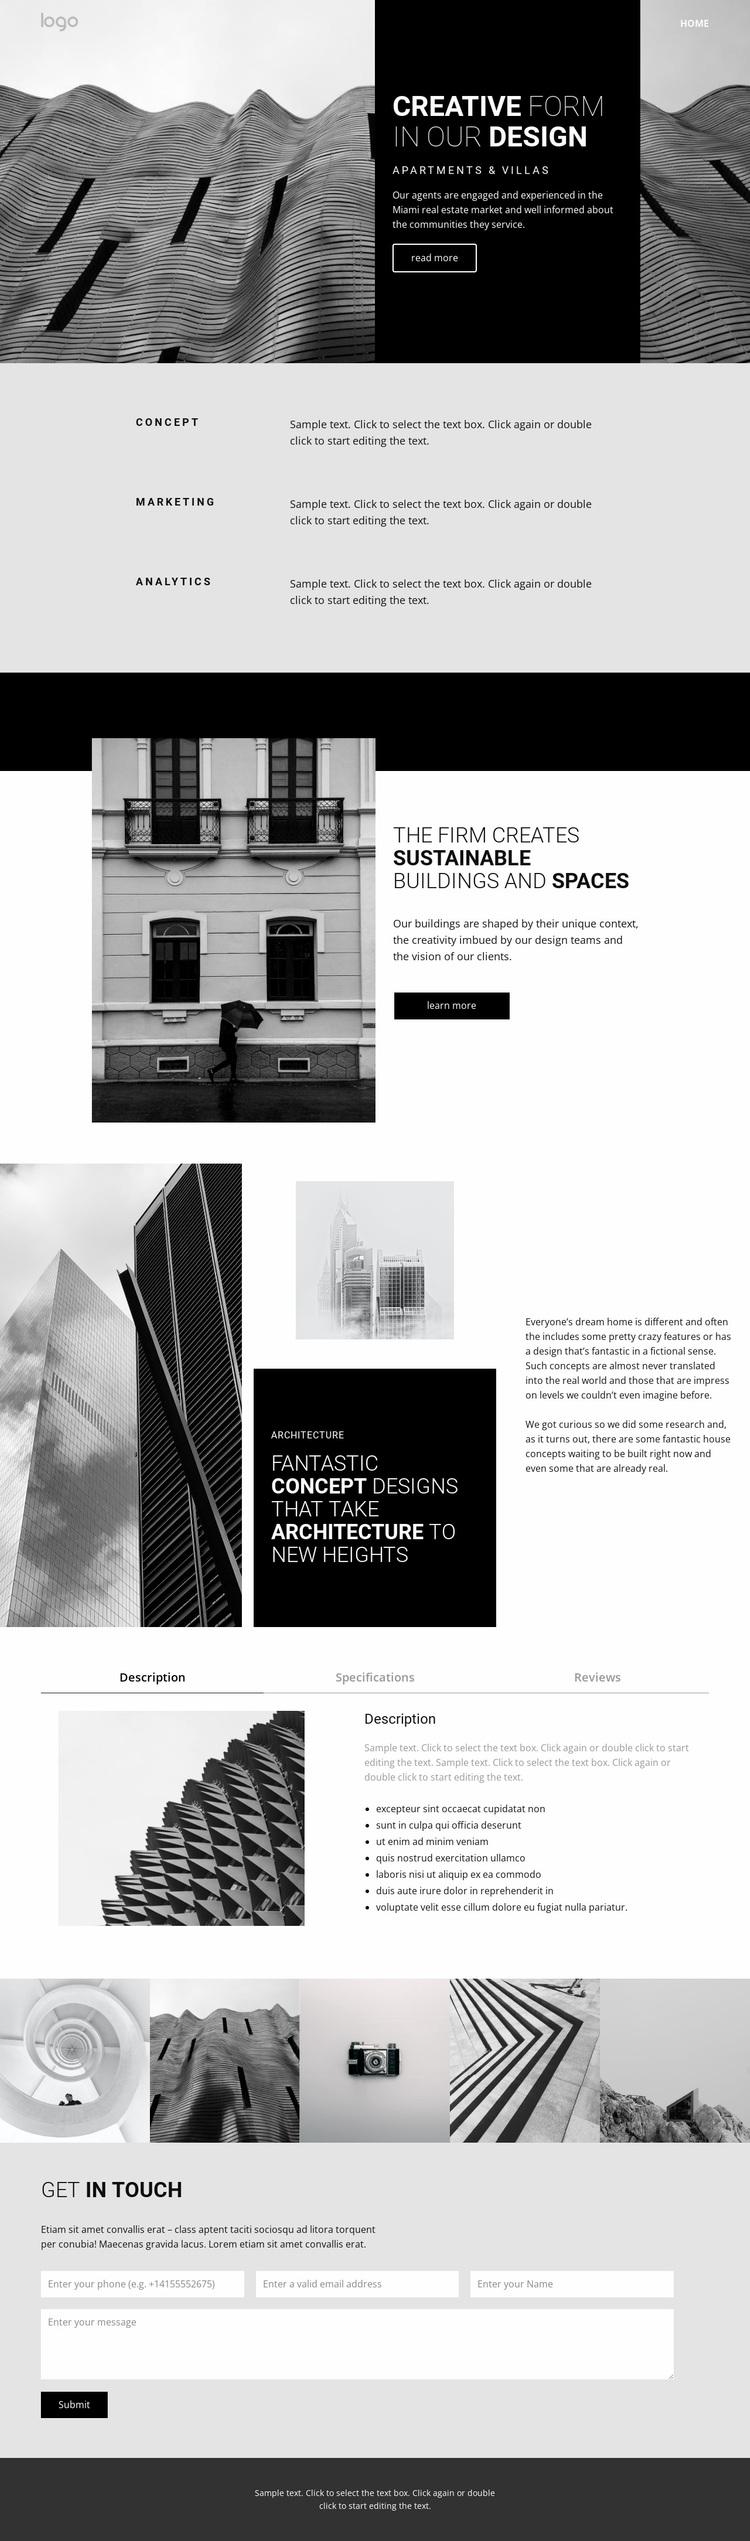 Creative concept architecture Website Design